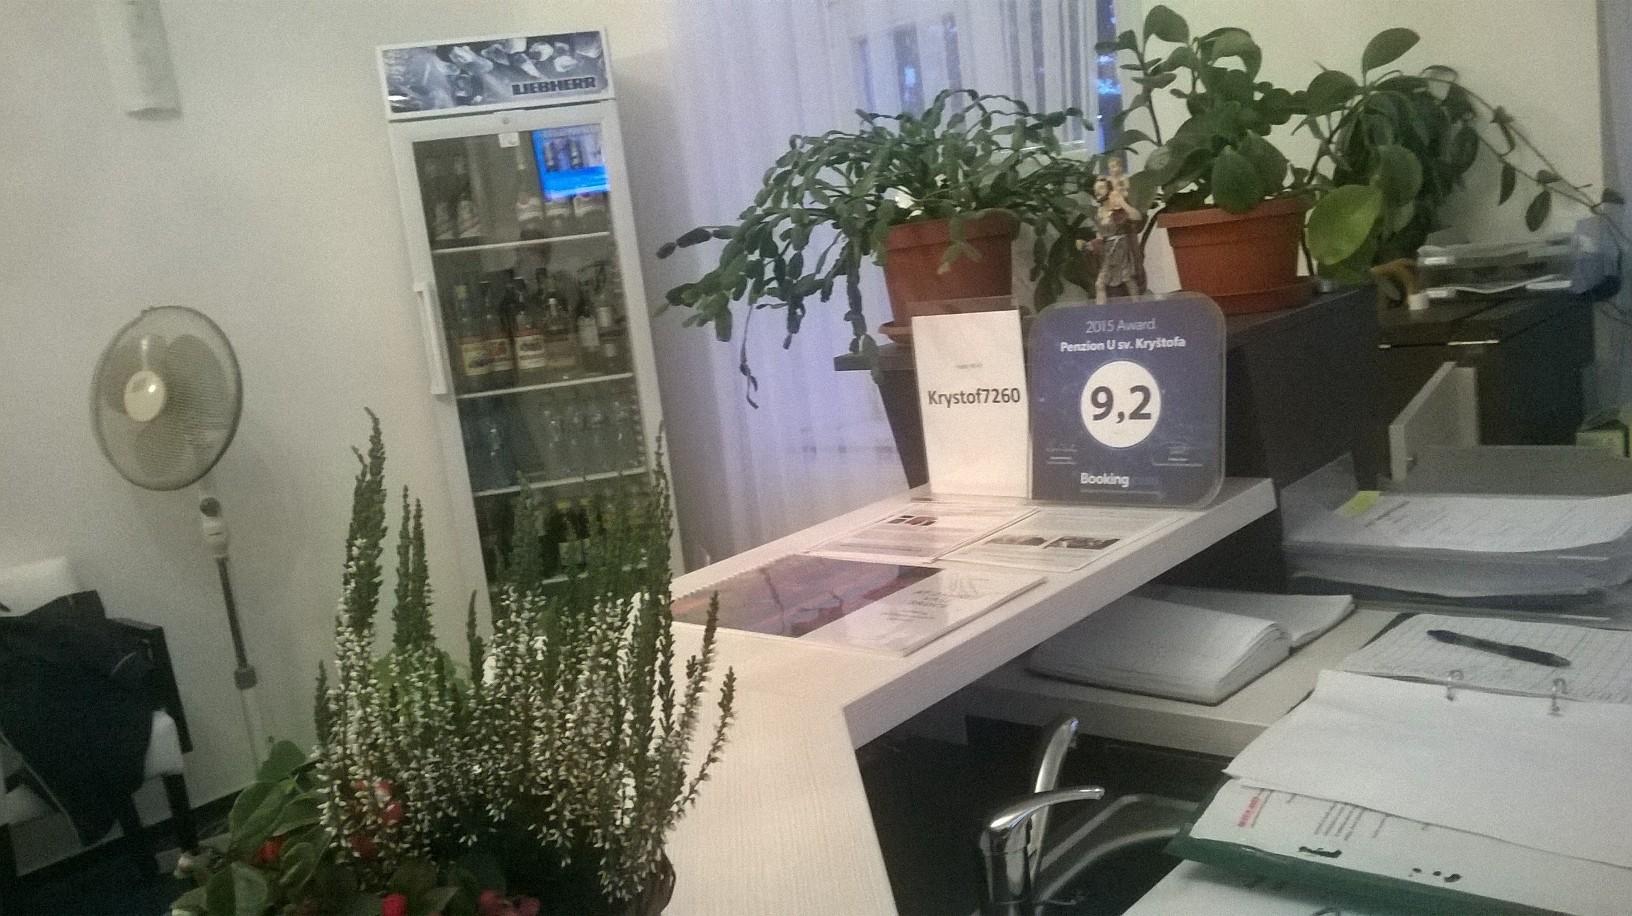 prague-penzion-u-krystof-hotel-lobby-oct16